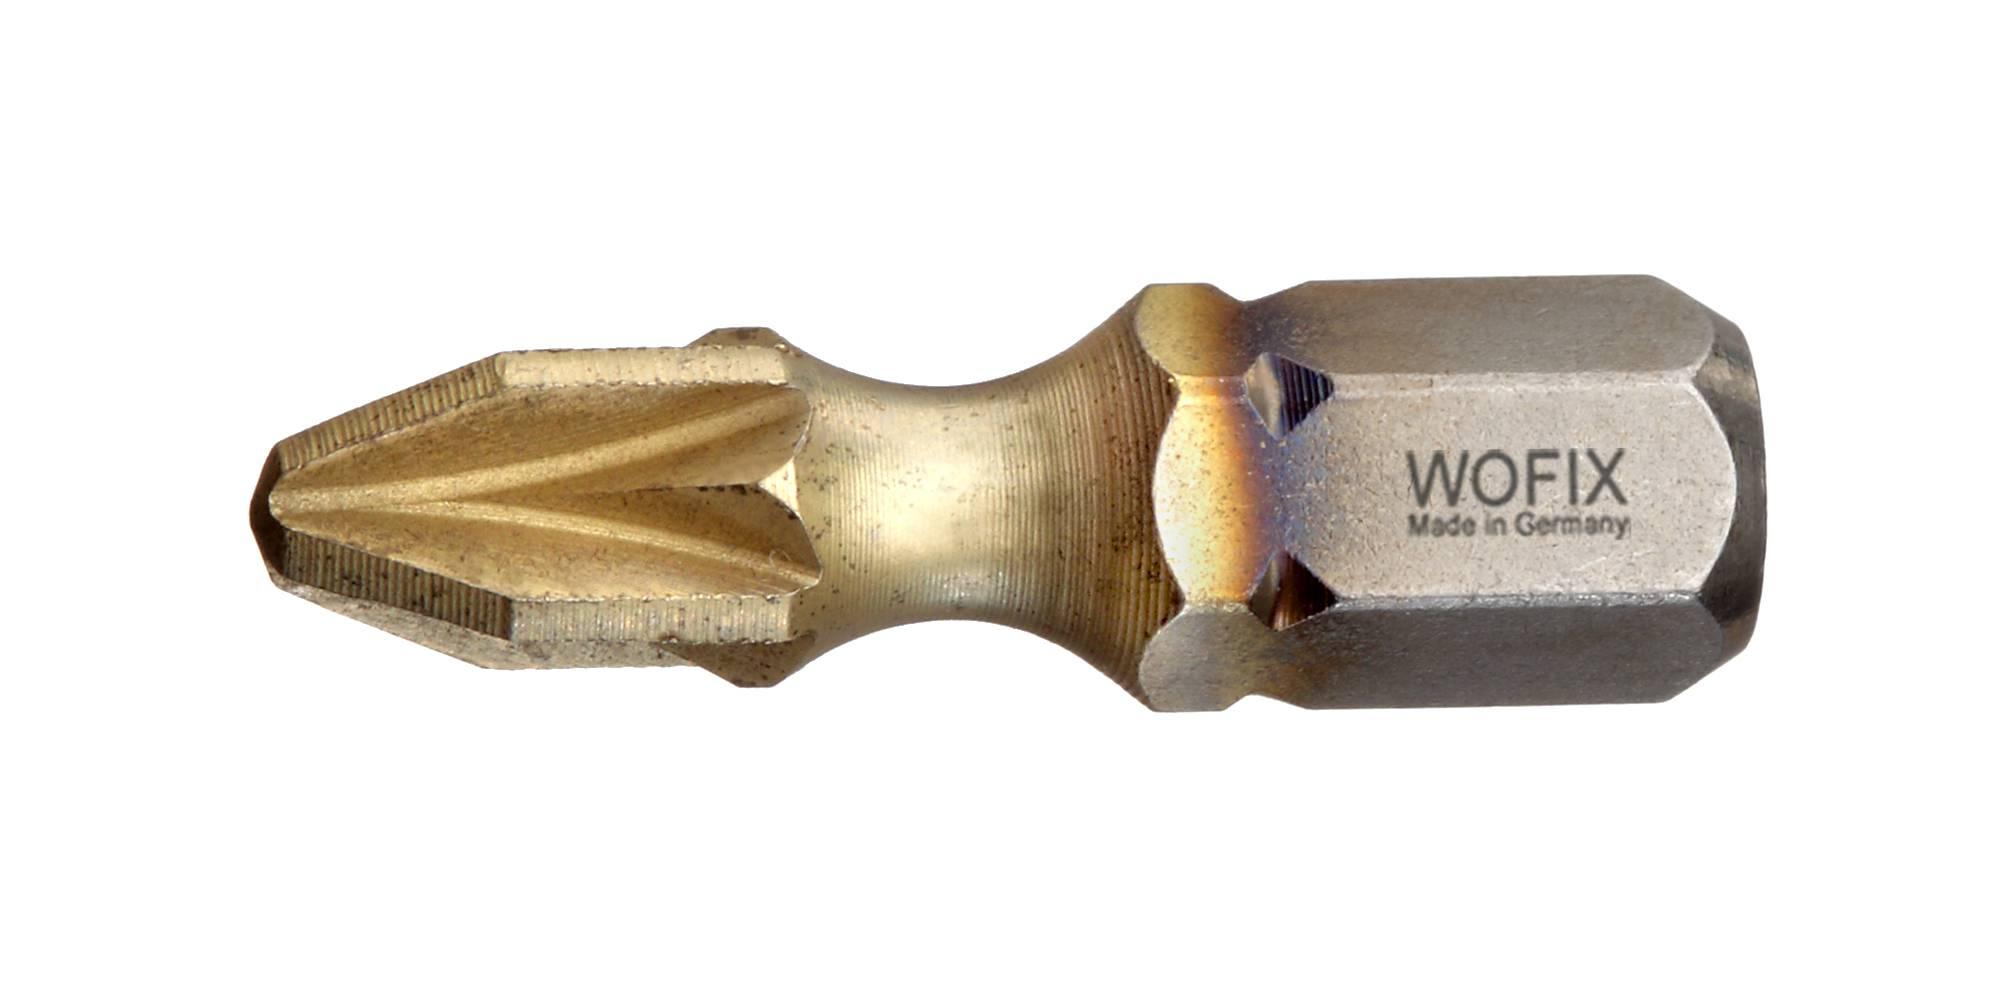 Wofix 7336225 Titanium Zirconium Pozidrive bit - PZ2 x 25 mm